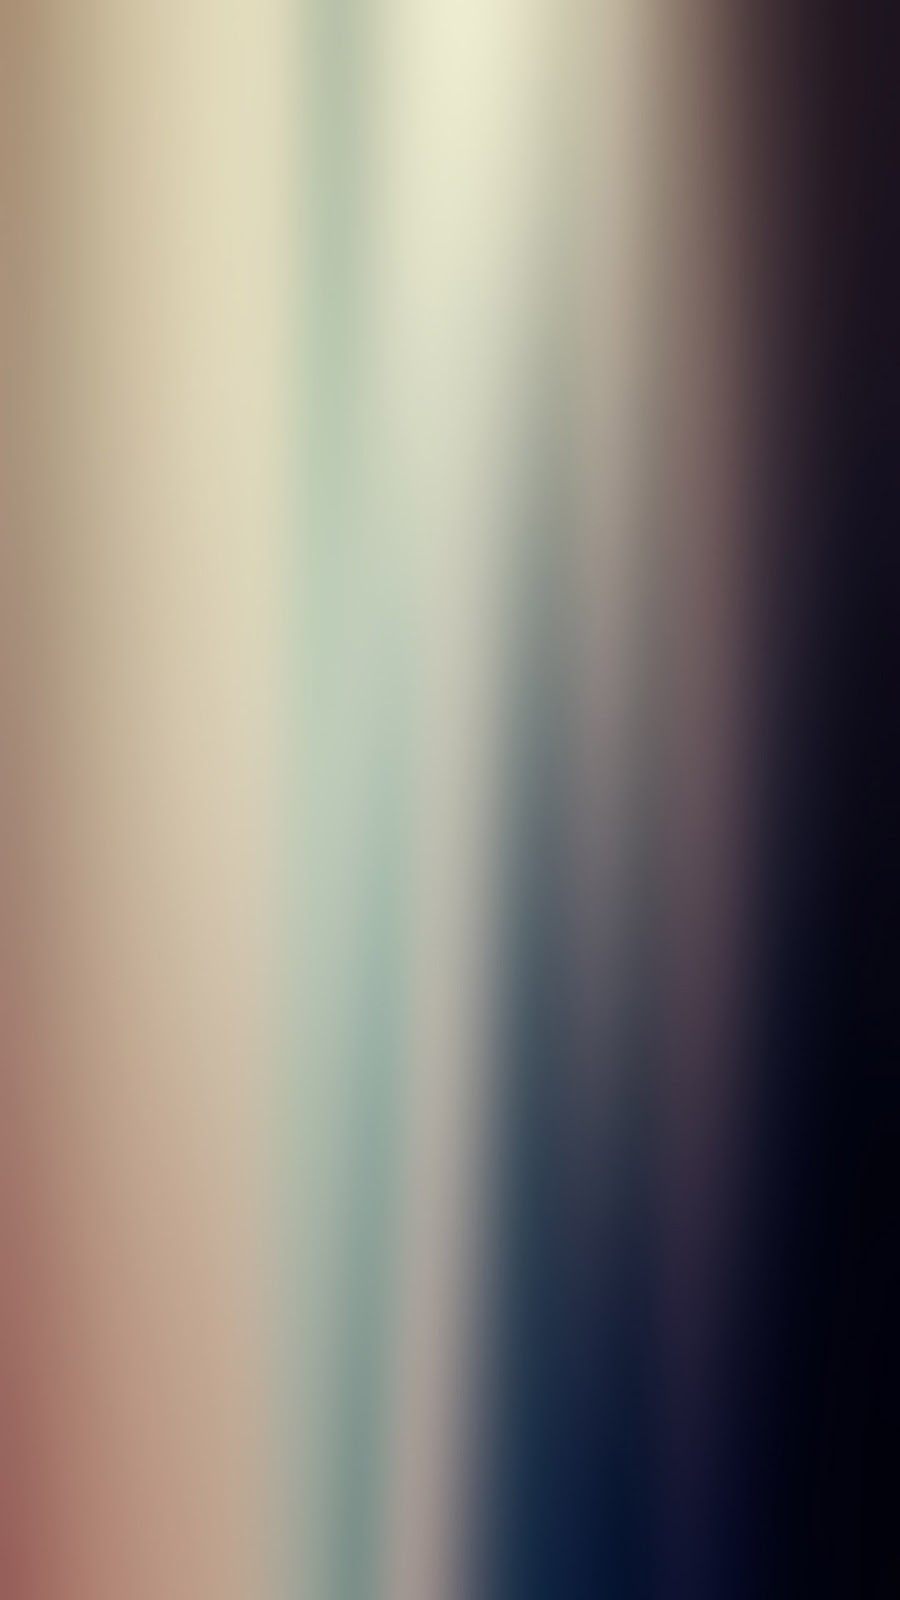 خلفيات ايفون 6 بلس